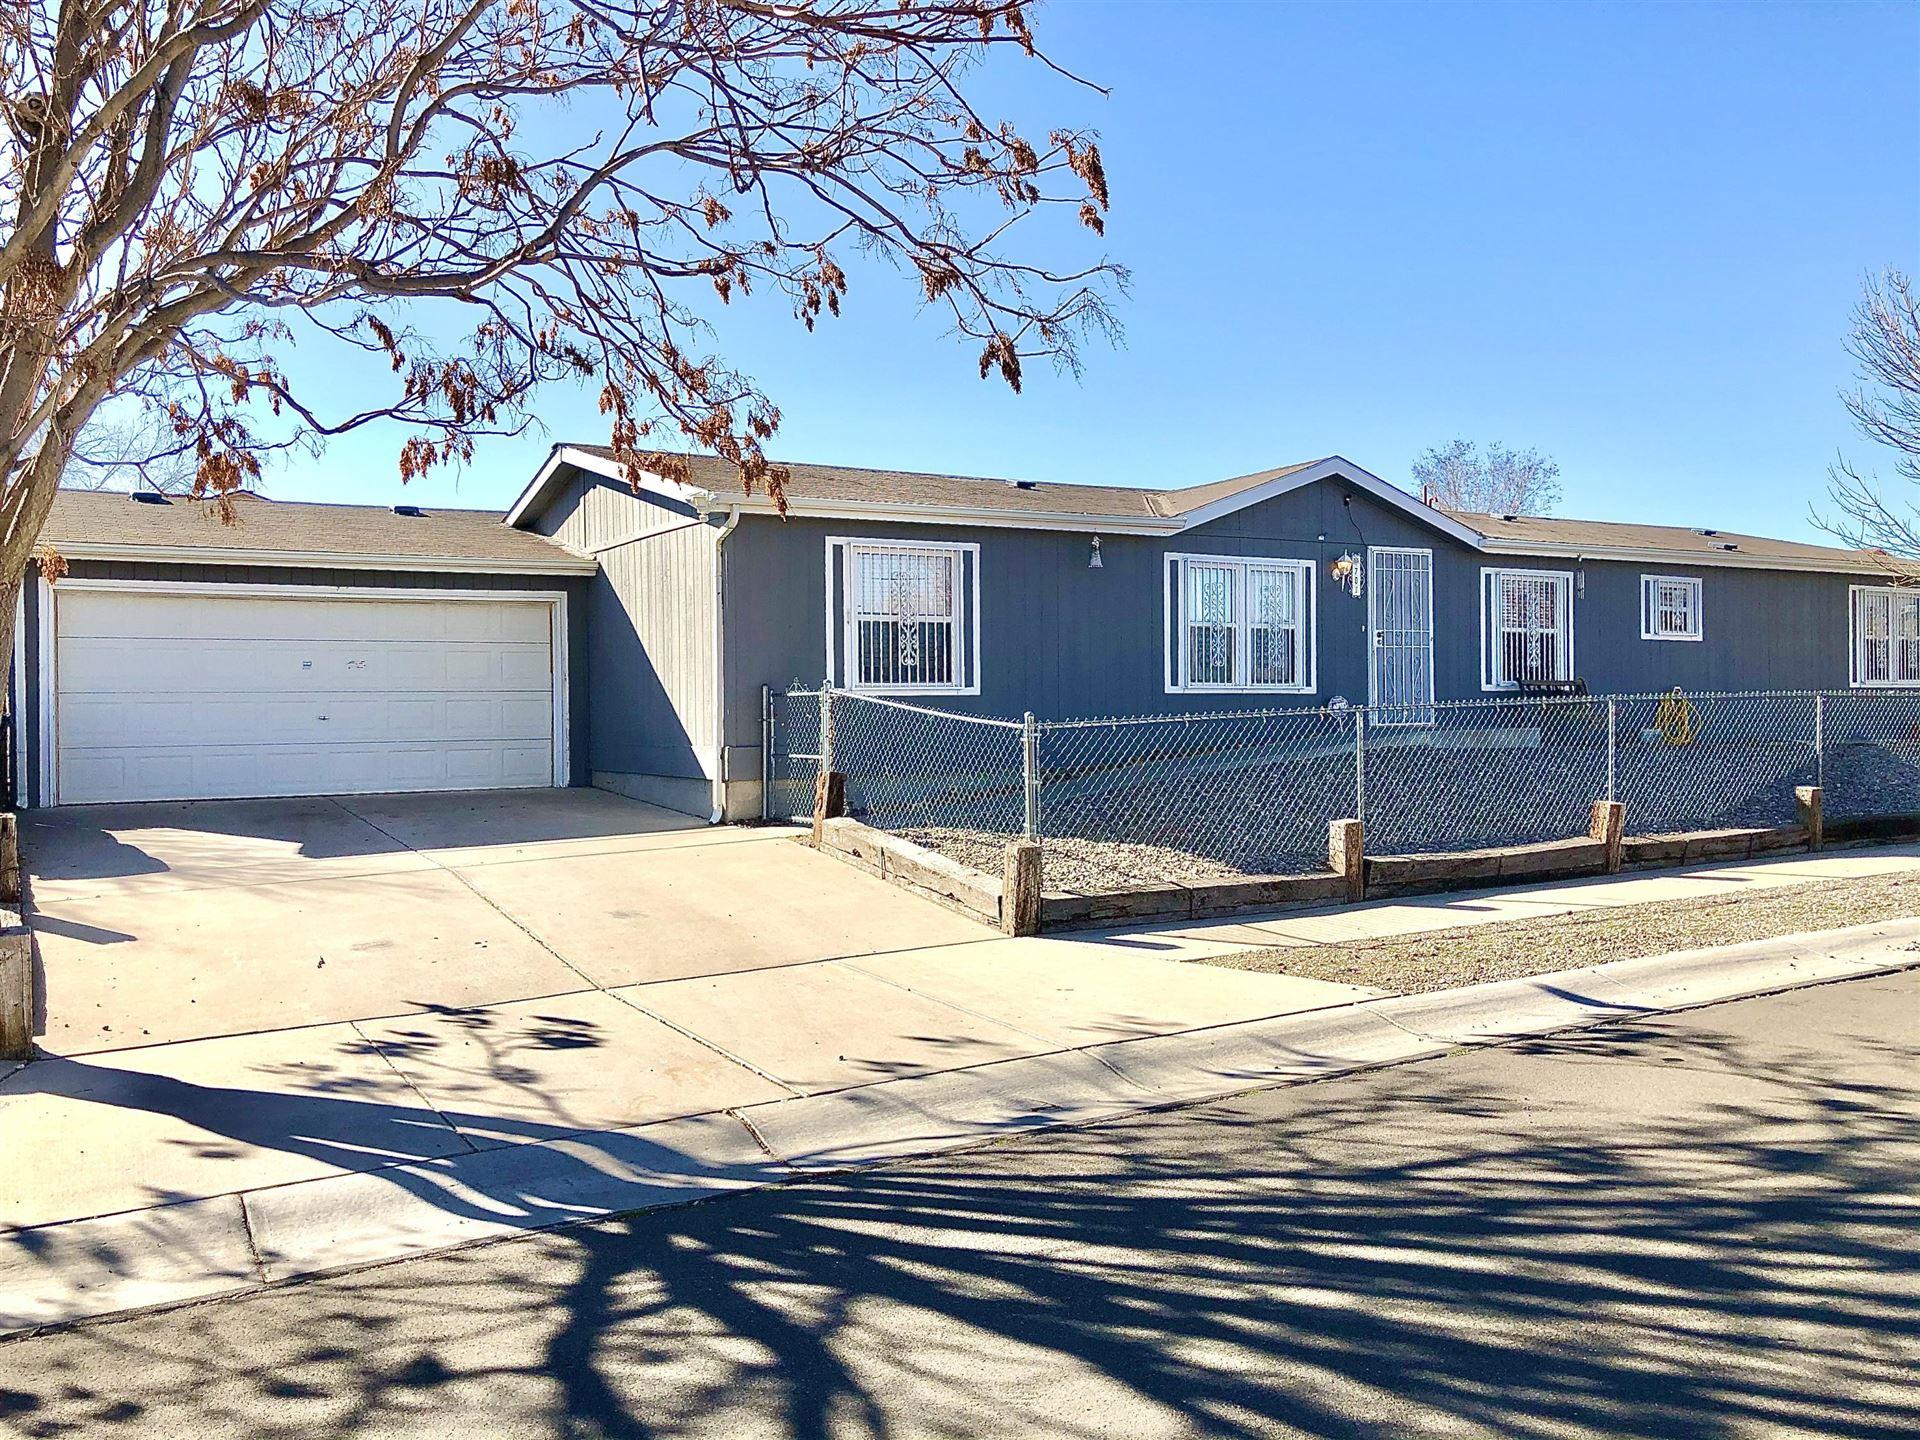 701 VISTA DEL PUEBLO Street SW, Albuquerque, NM 87121 - MLS#: 986974